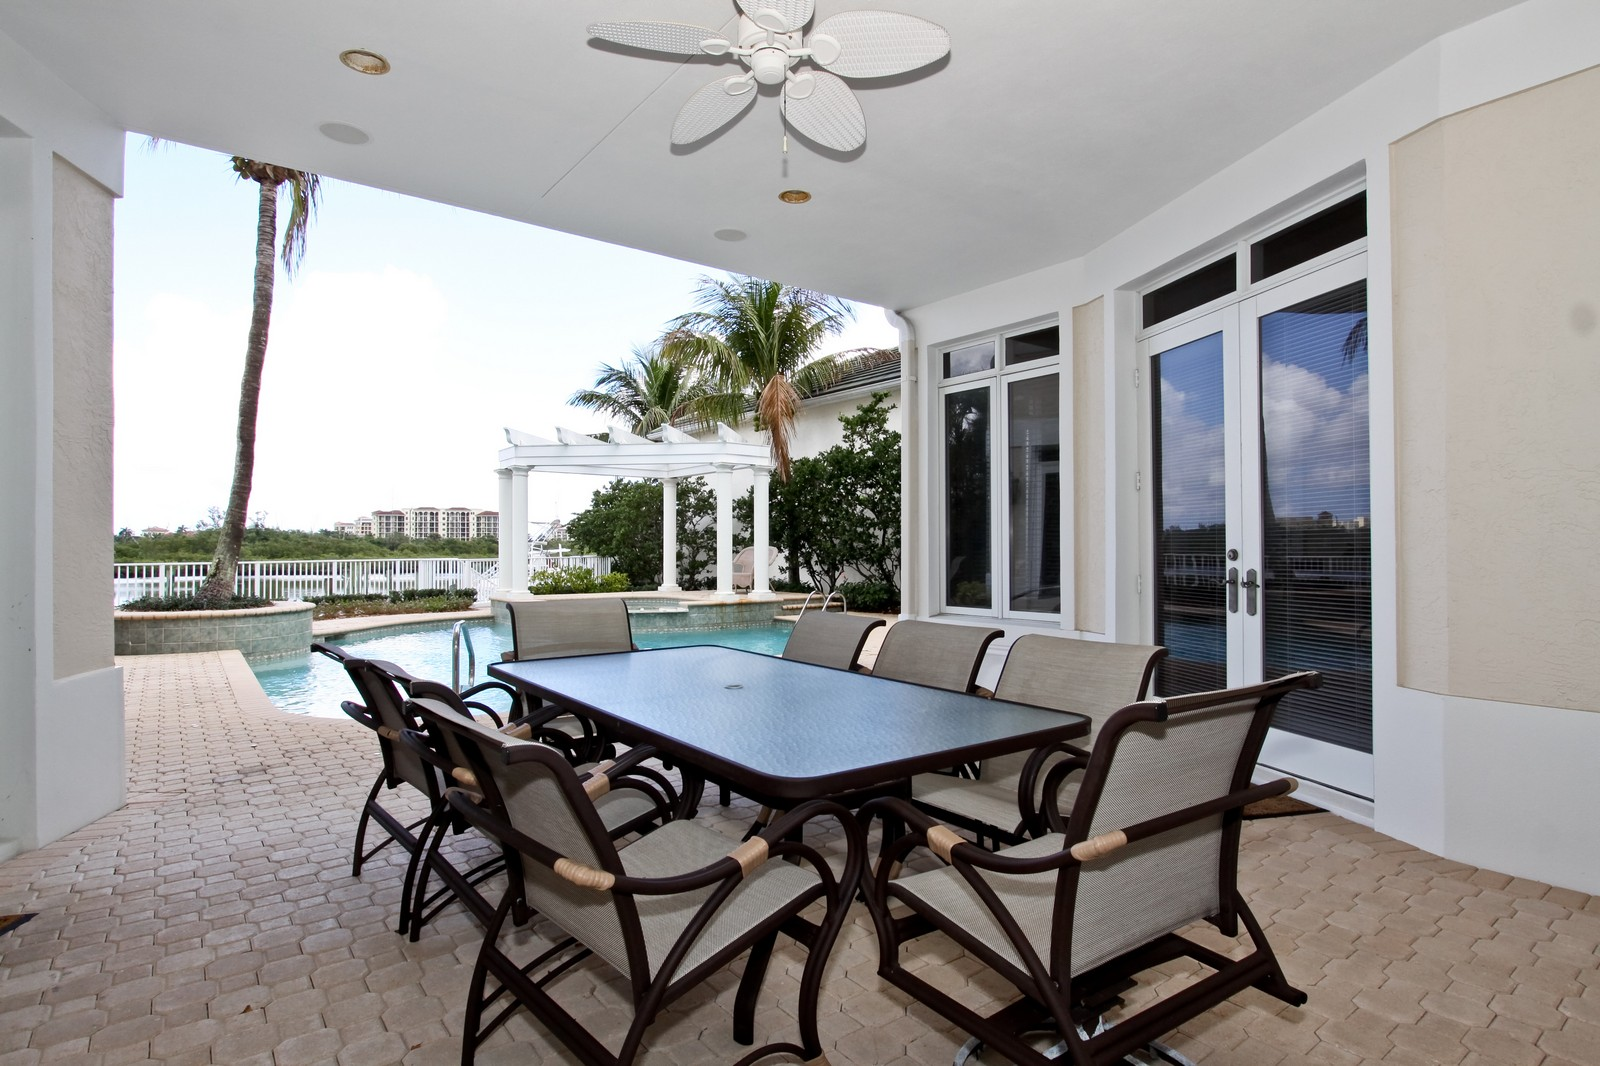 Real Estate Photography - 3527 Jonathans Harbour Dr, Jupiter, FL, 33477 - Patio